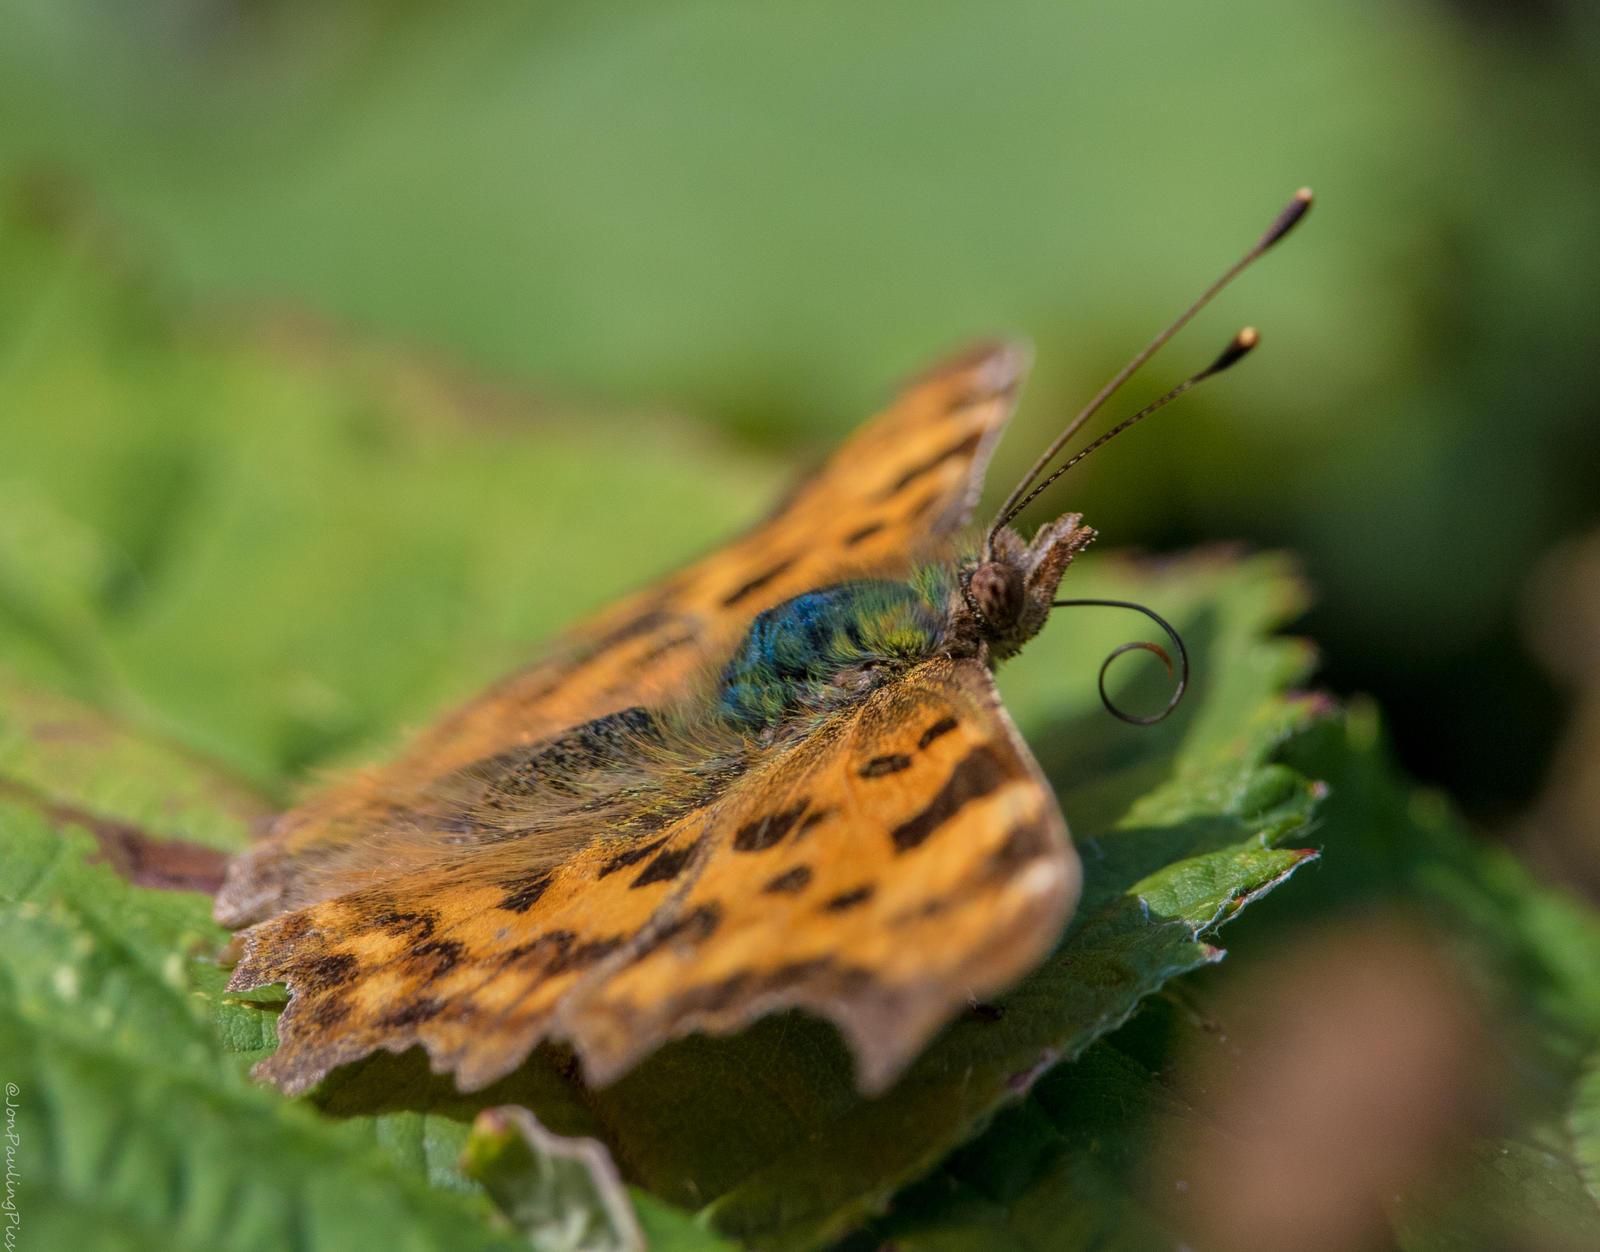 Flutterby by Mincingyoda